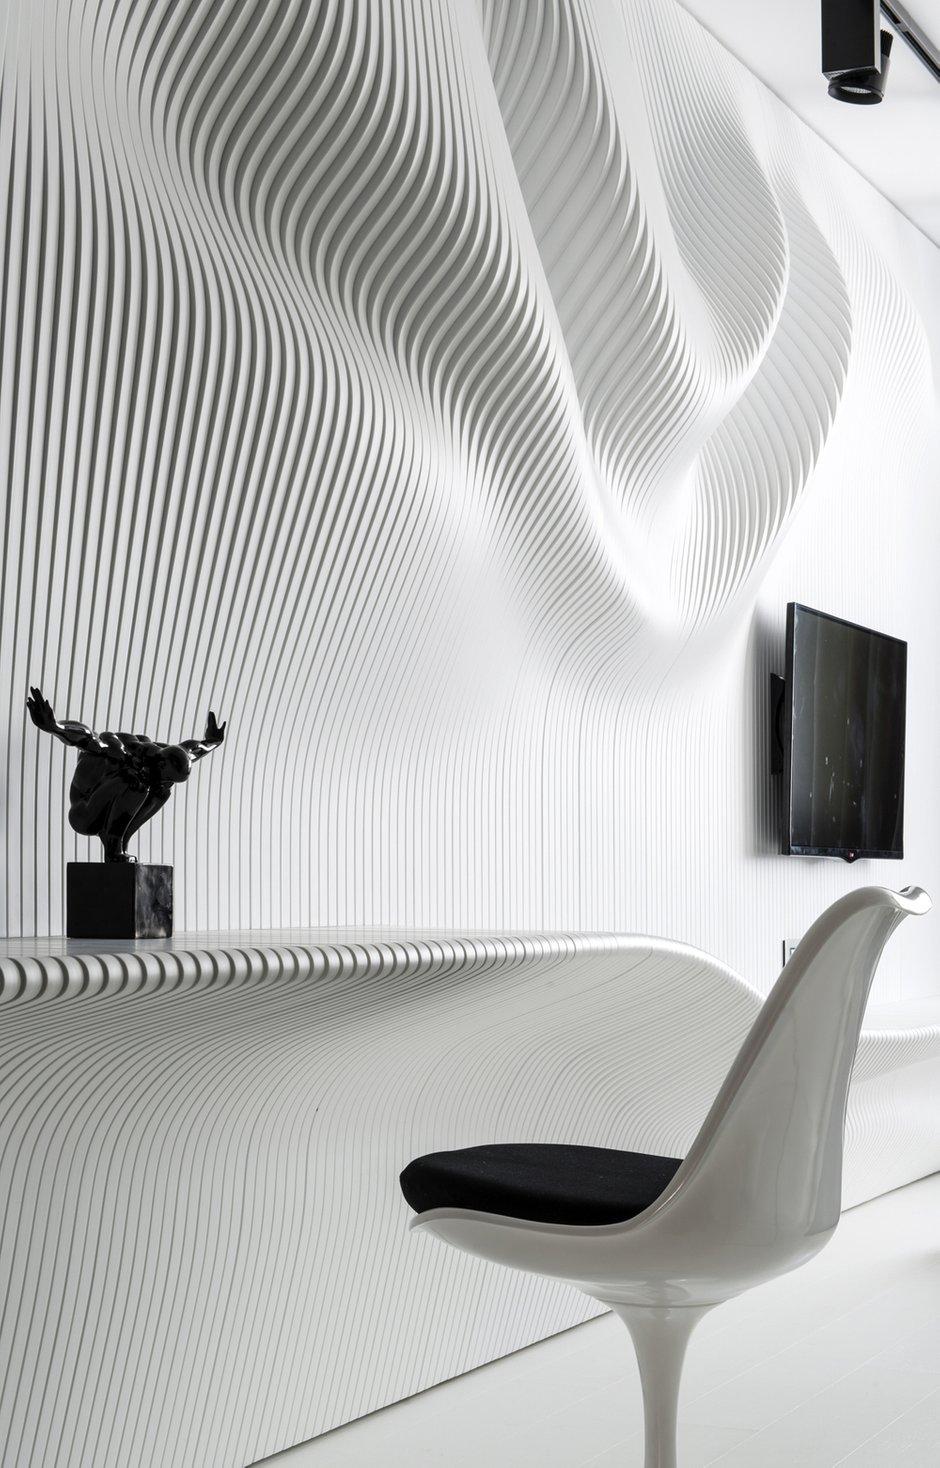 Фотография: Декор в стиле Хай-тек, Спальня, Интерьер комнат, Проект недели, Ар-деко – фото на InMyRoom.ru